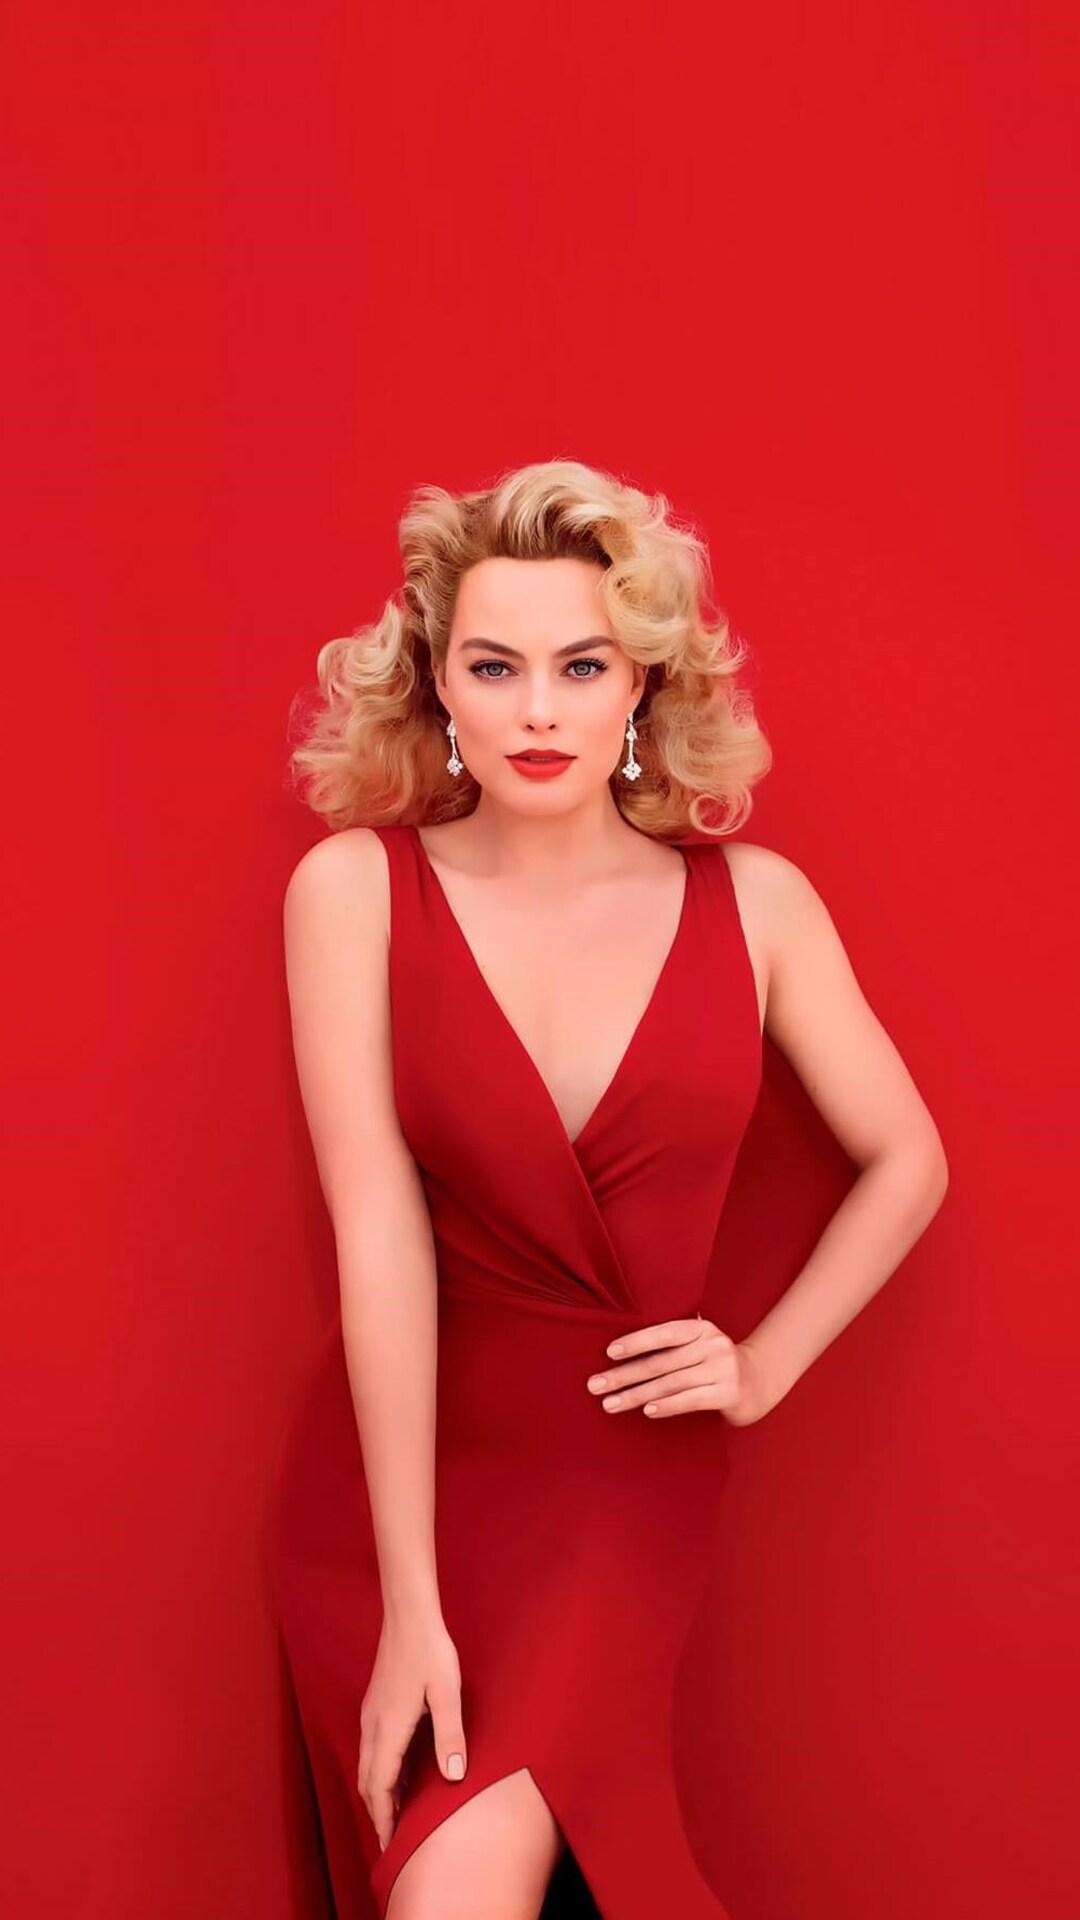 margot-robbie-in-red-dress-img.jpg